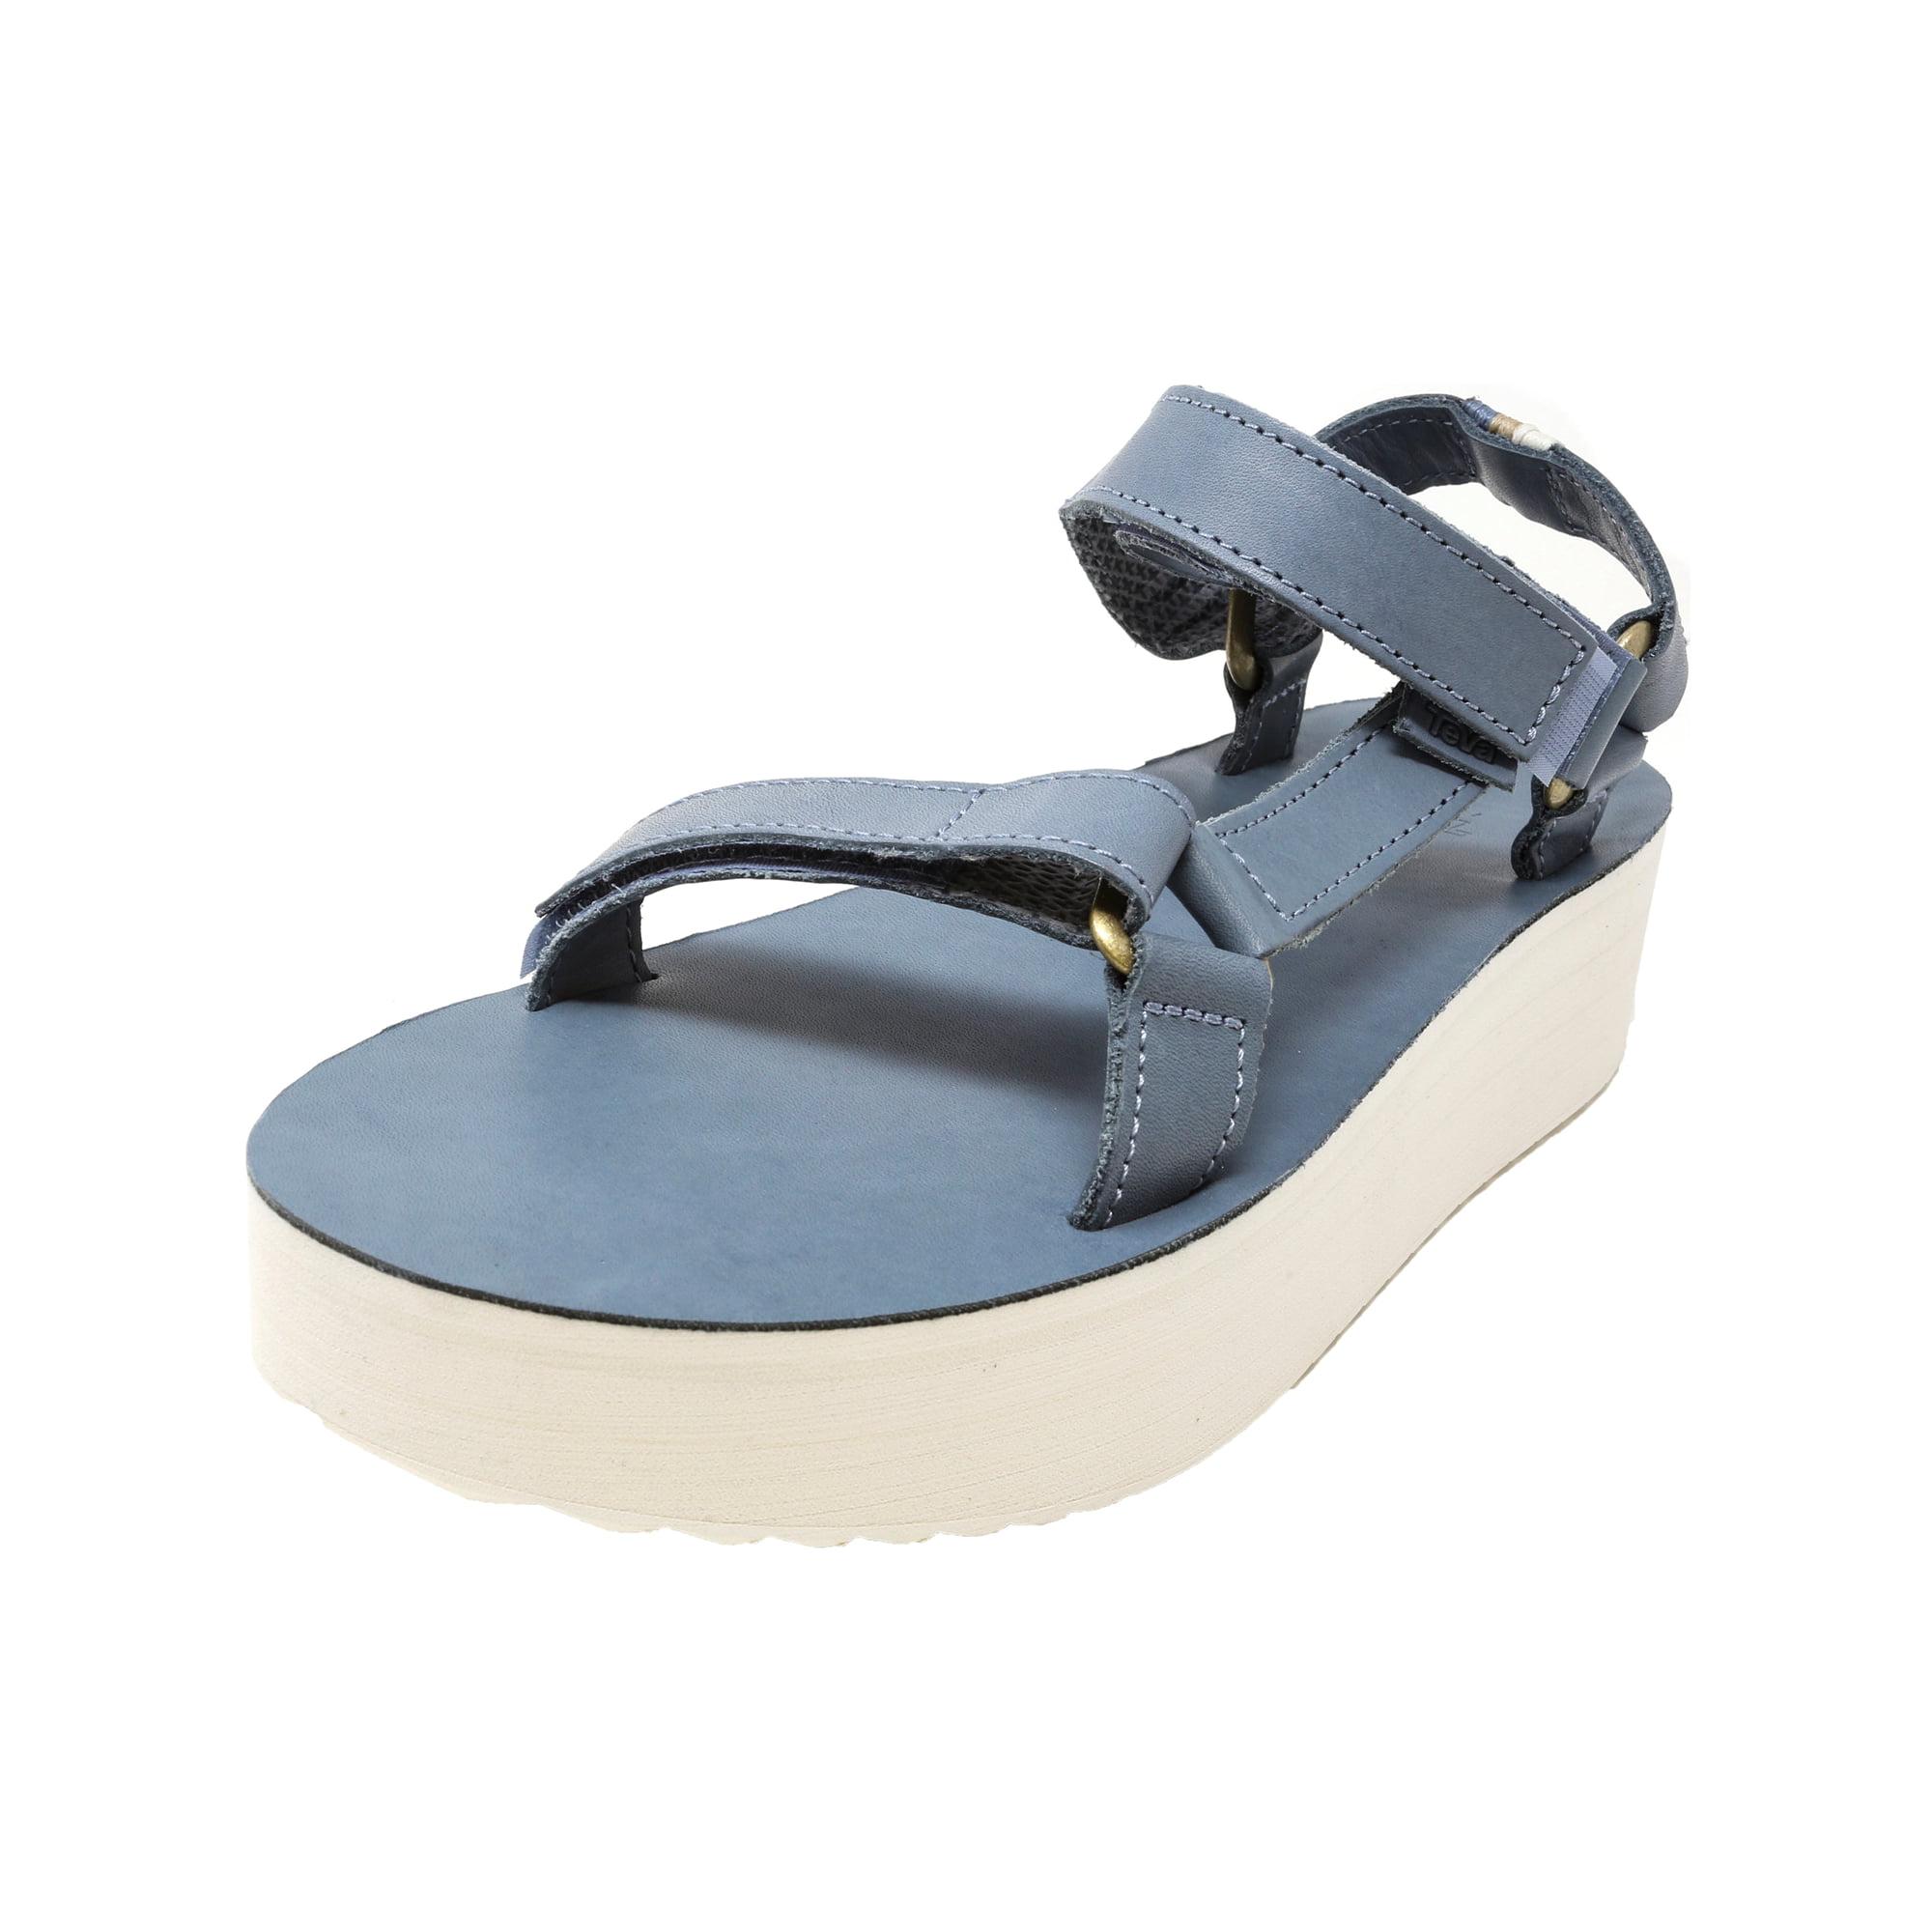 0e7e6bd1737d Teva Women s Flatform Universal Crafted Citadel Ankle-High Leather Sandal -  6M